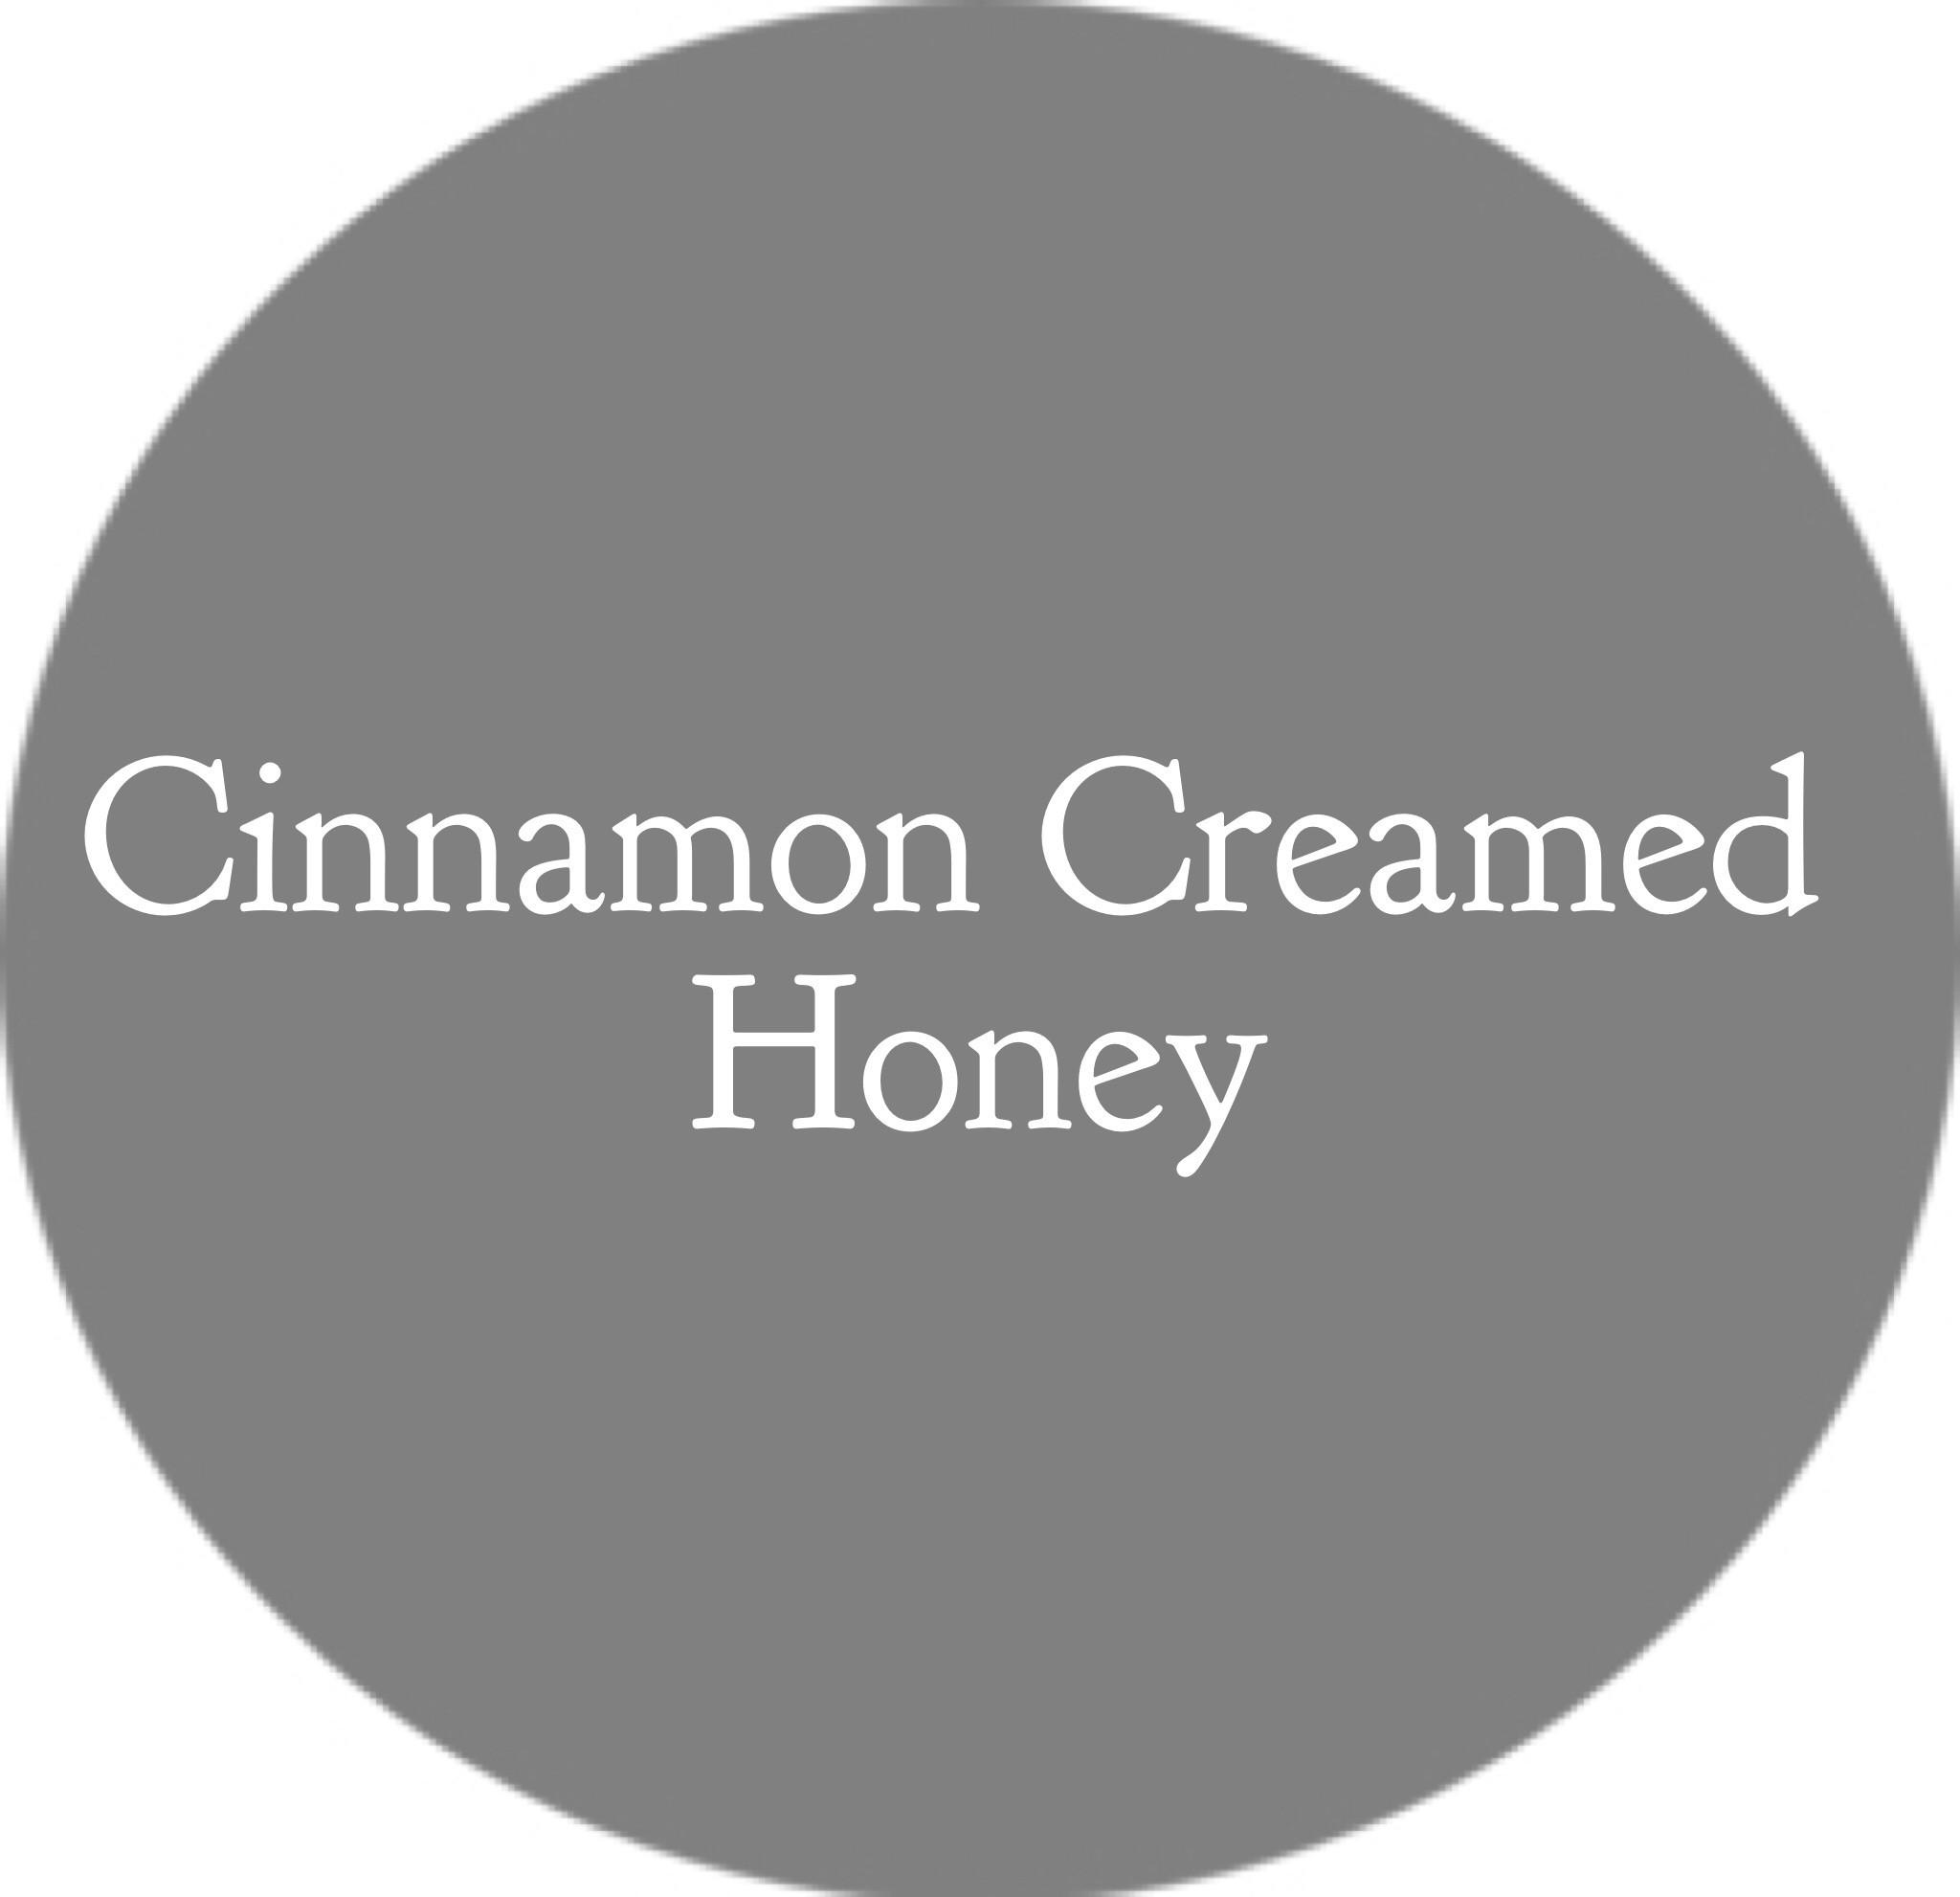 Honey- Cinnamon Creamed Honey